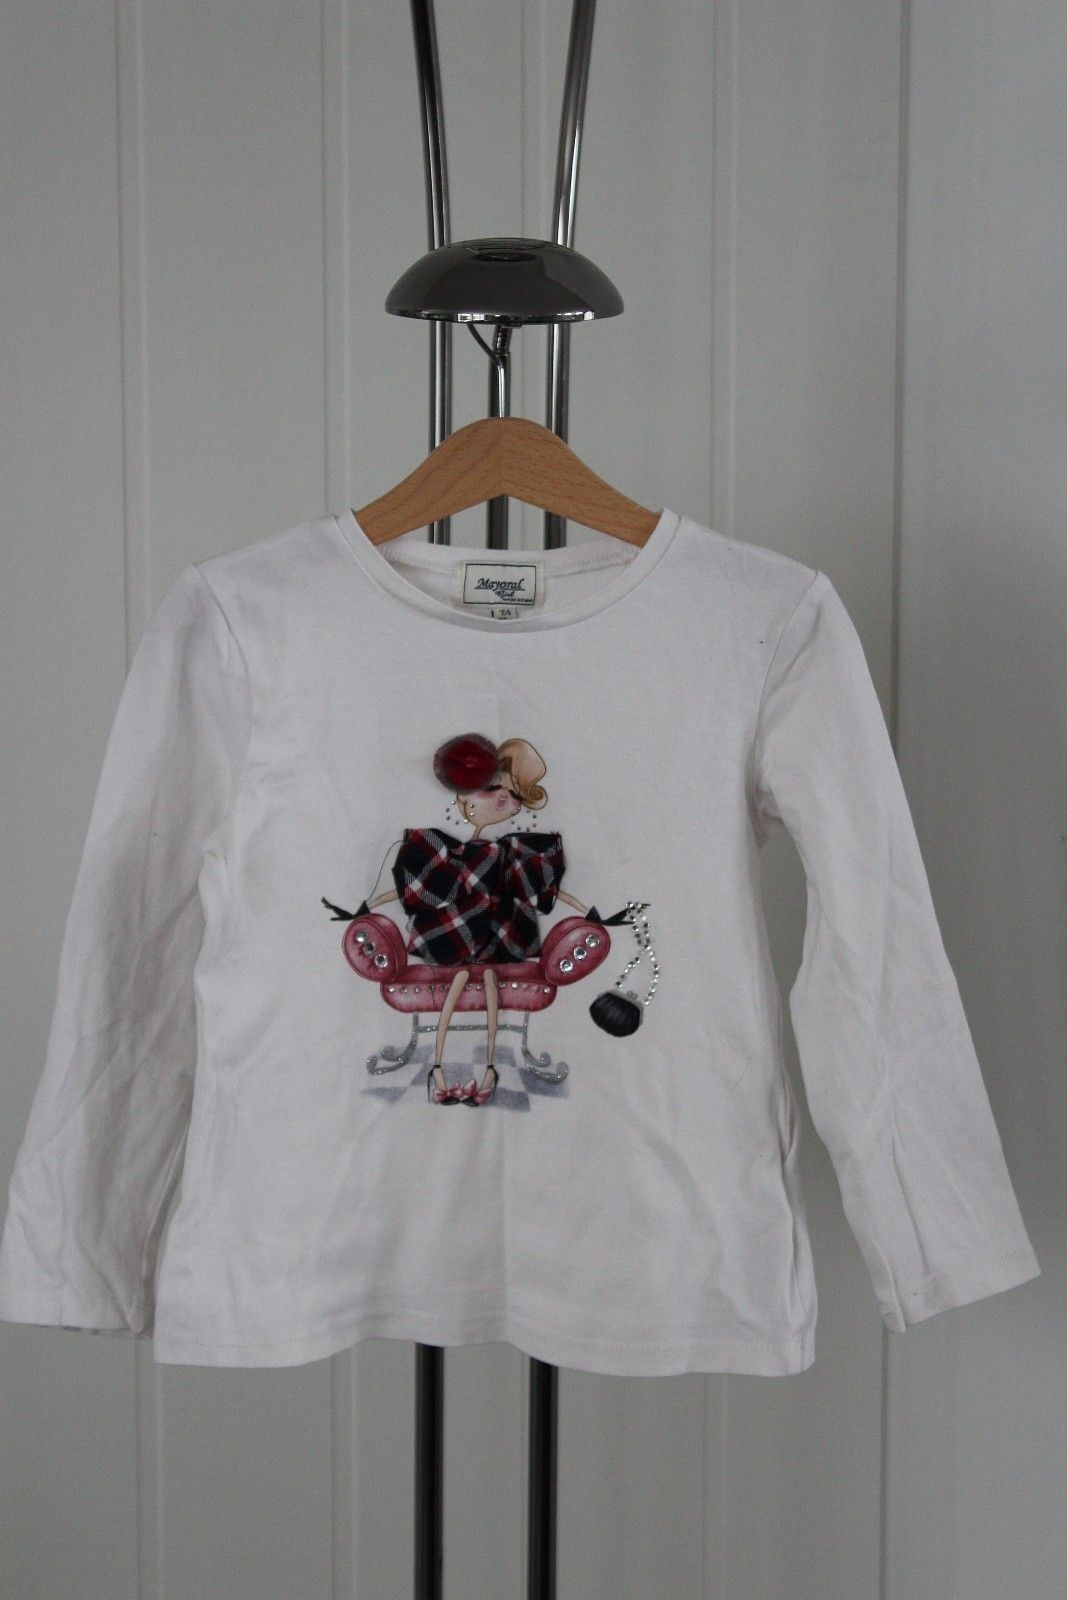 cdcaa5377 Masse fine klær til jente fra mayoral str 110. Som ny   FINN.no